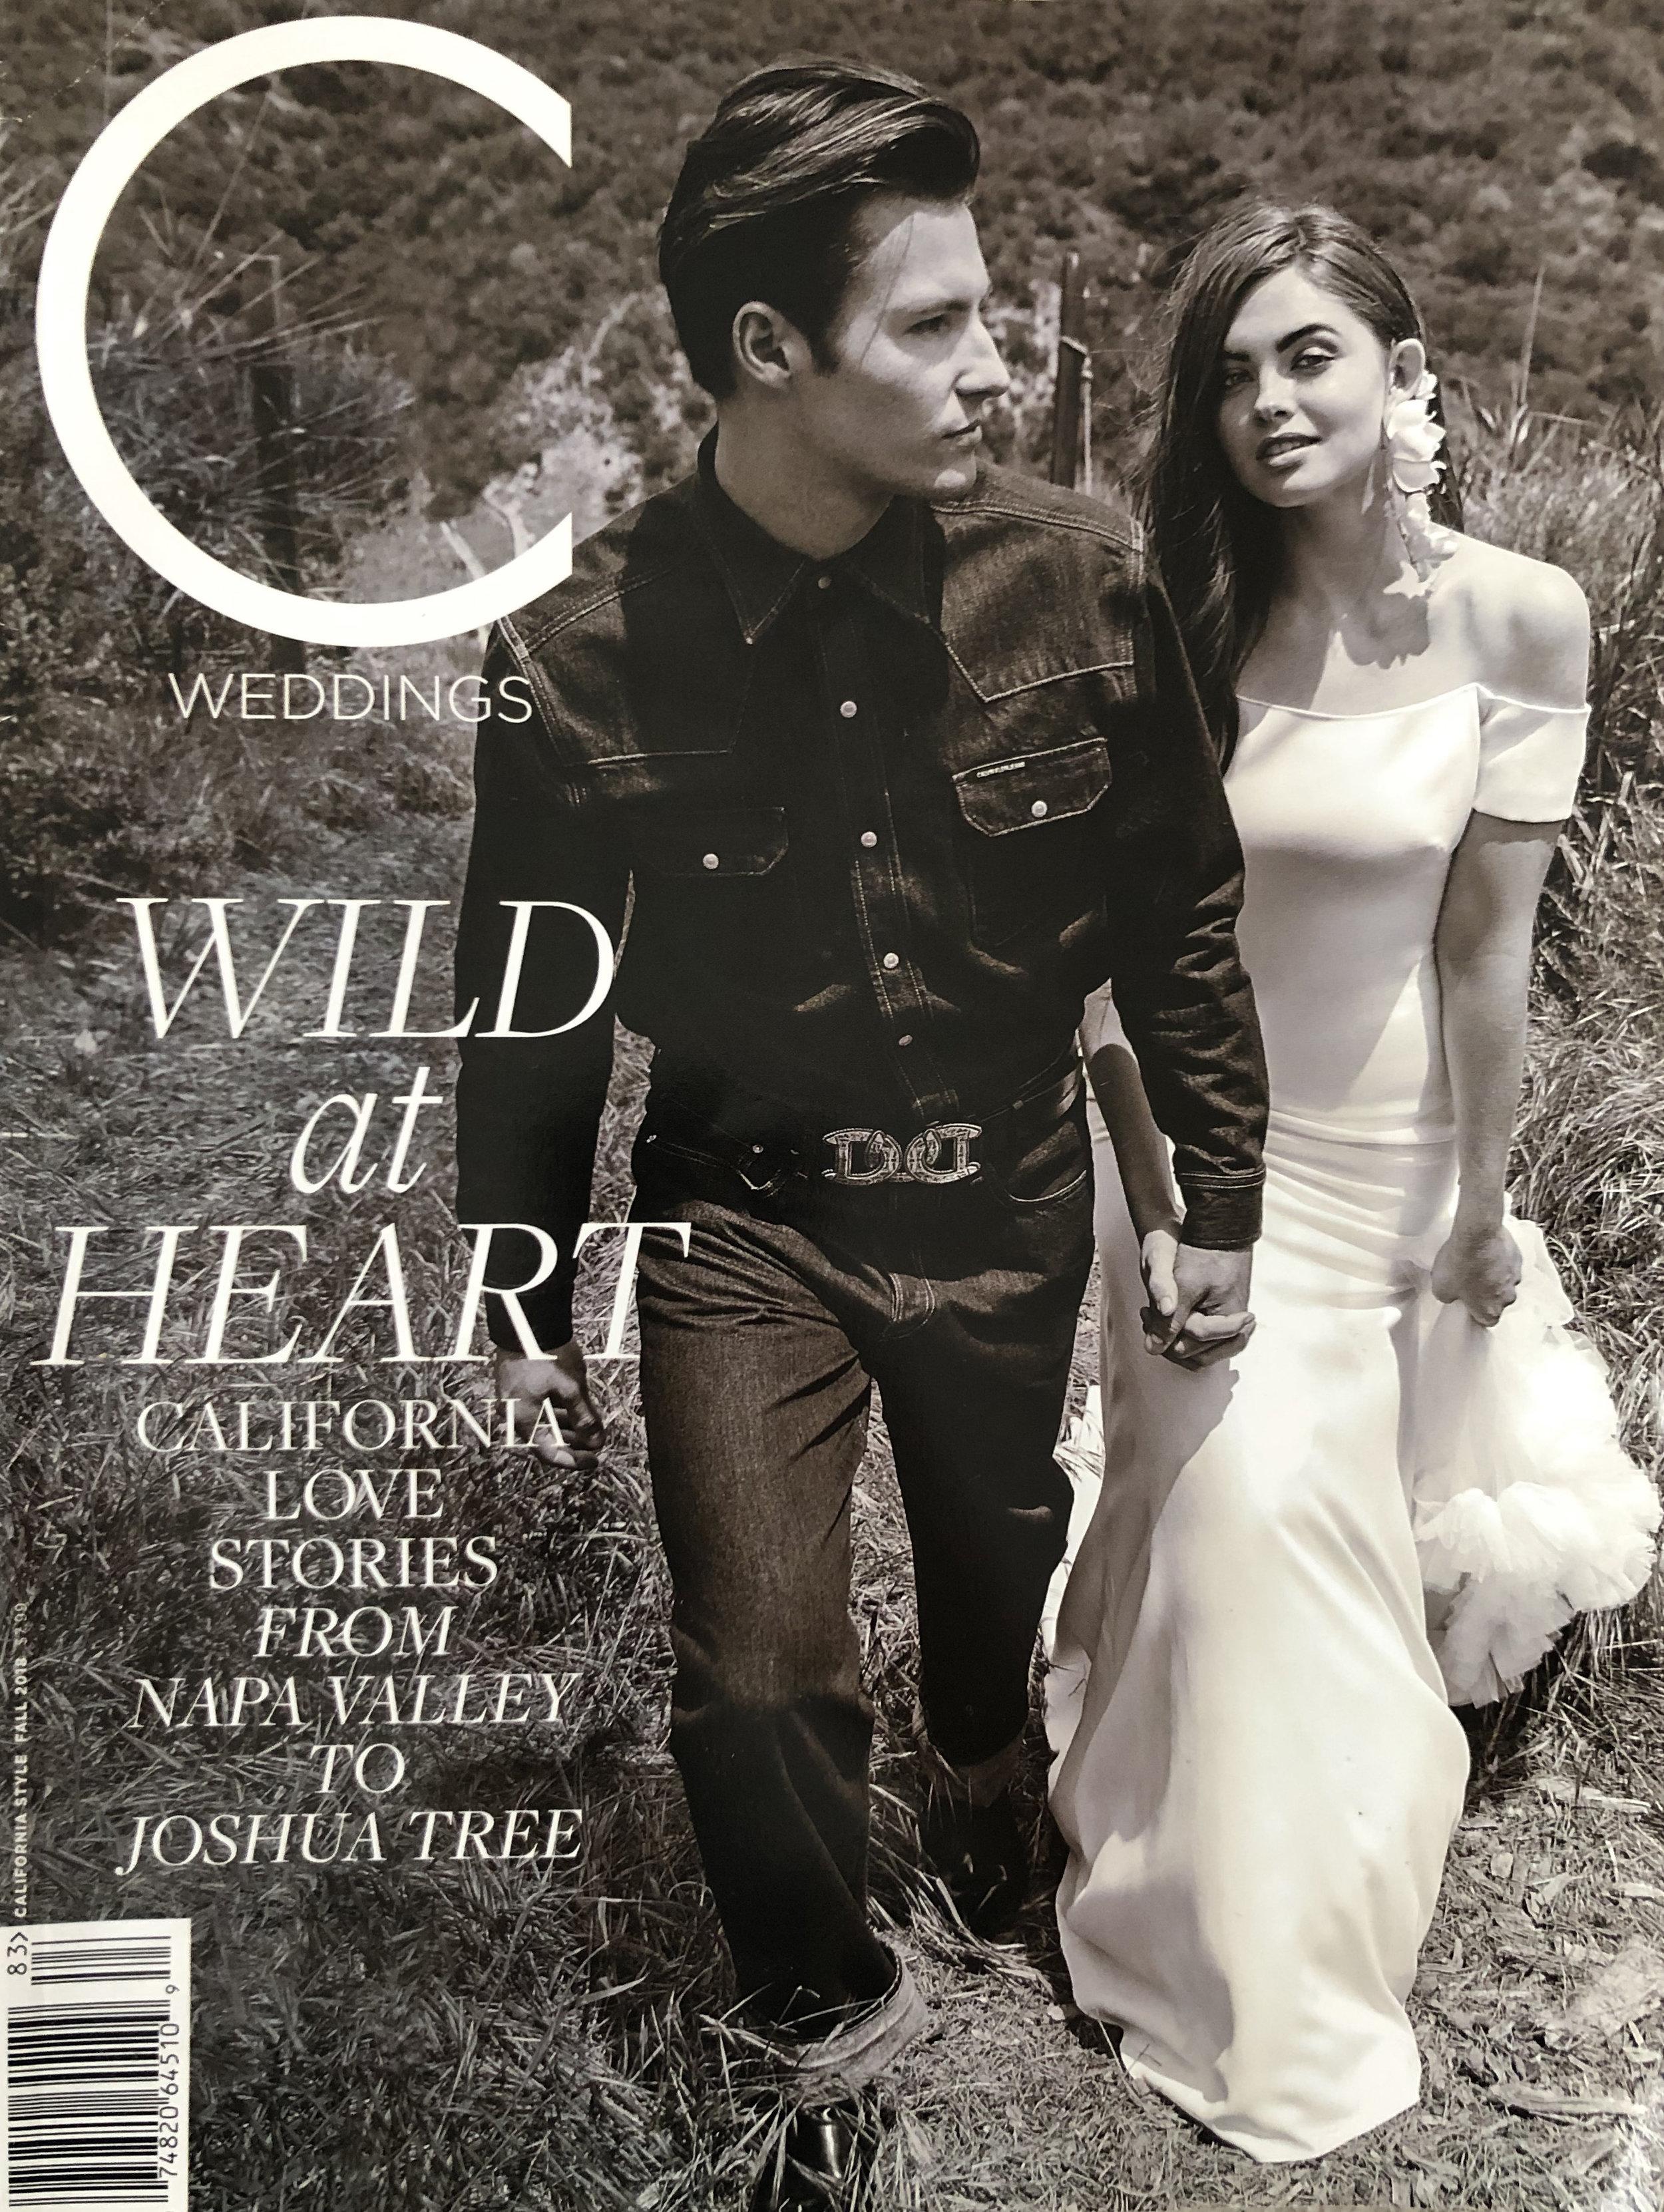 c magazine amanda chantal bacon wedding ISA ISA florals.jpg